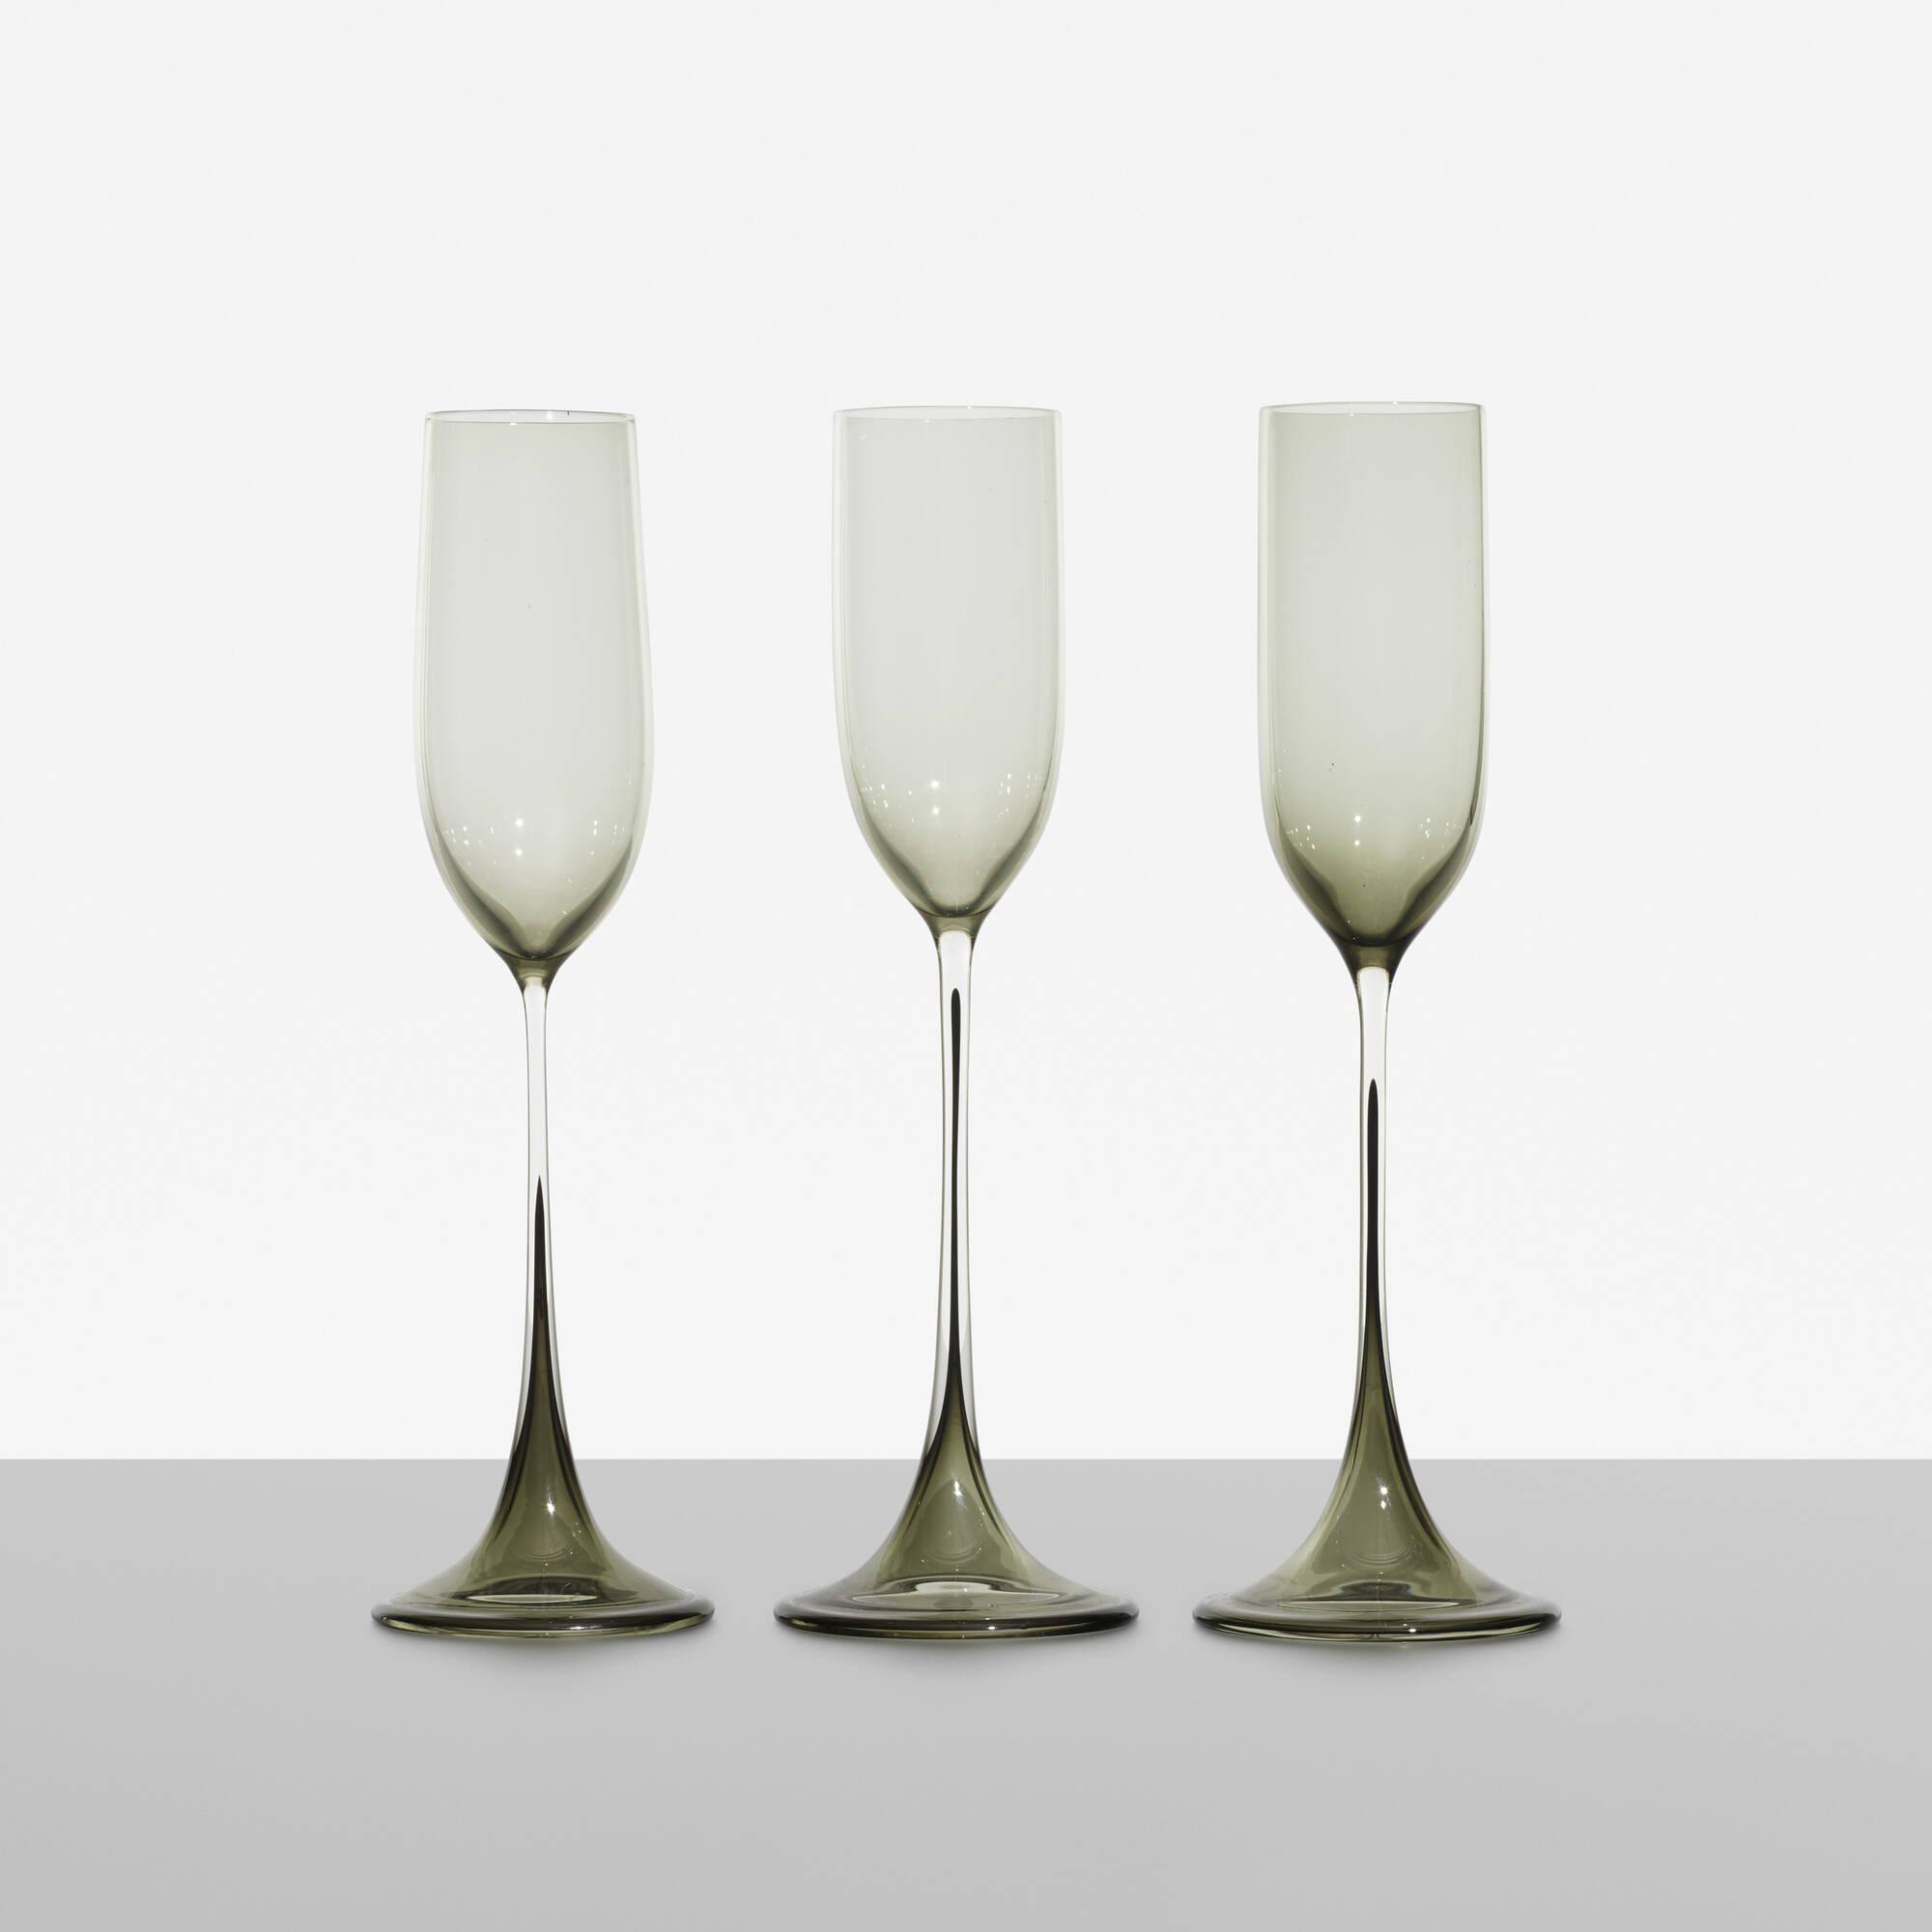 197: Nils Landberg / Tulpa glasses, set of three (1 of 2)